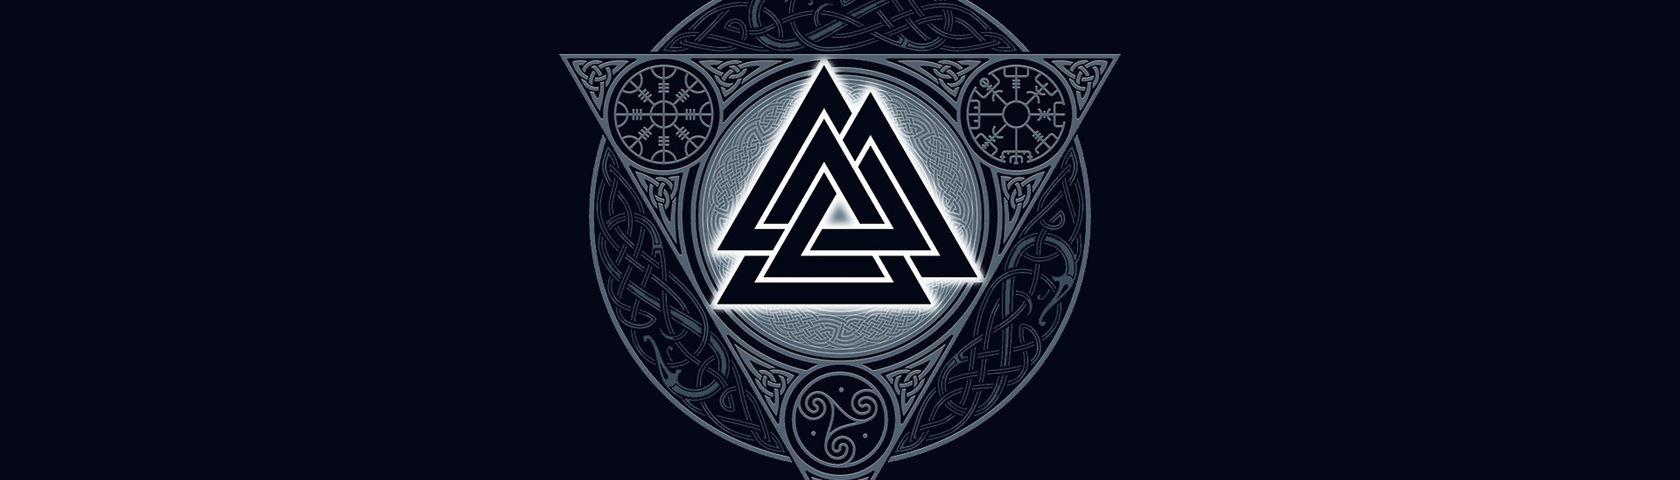 Asgardian Rune